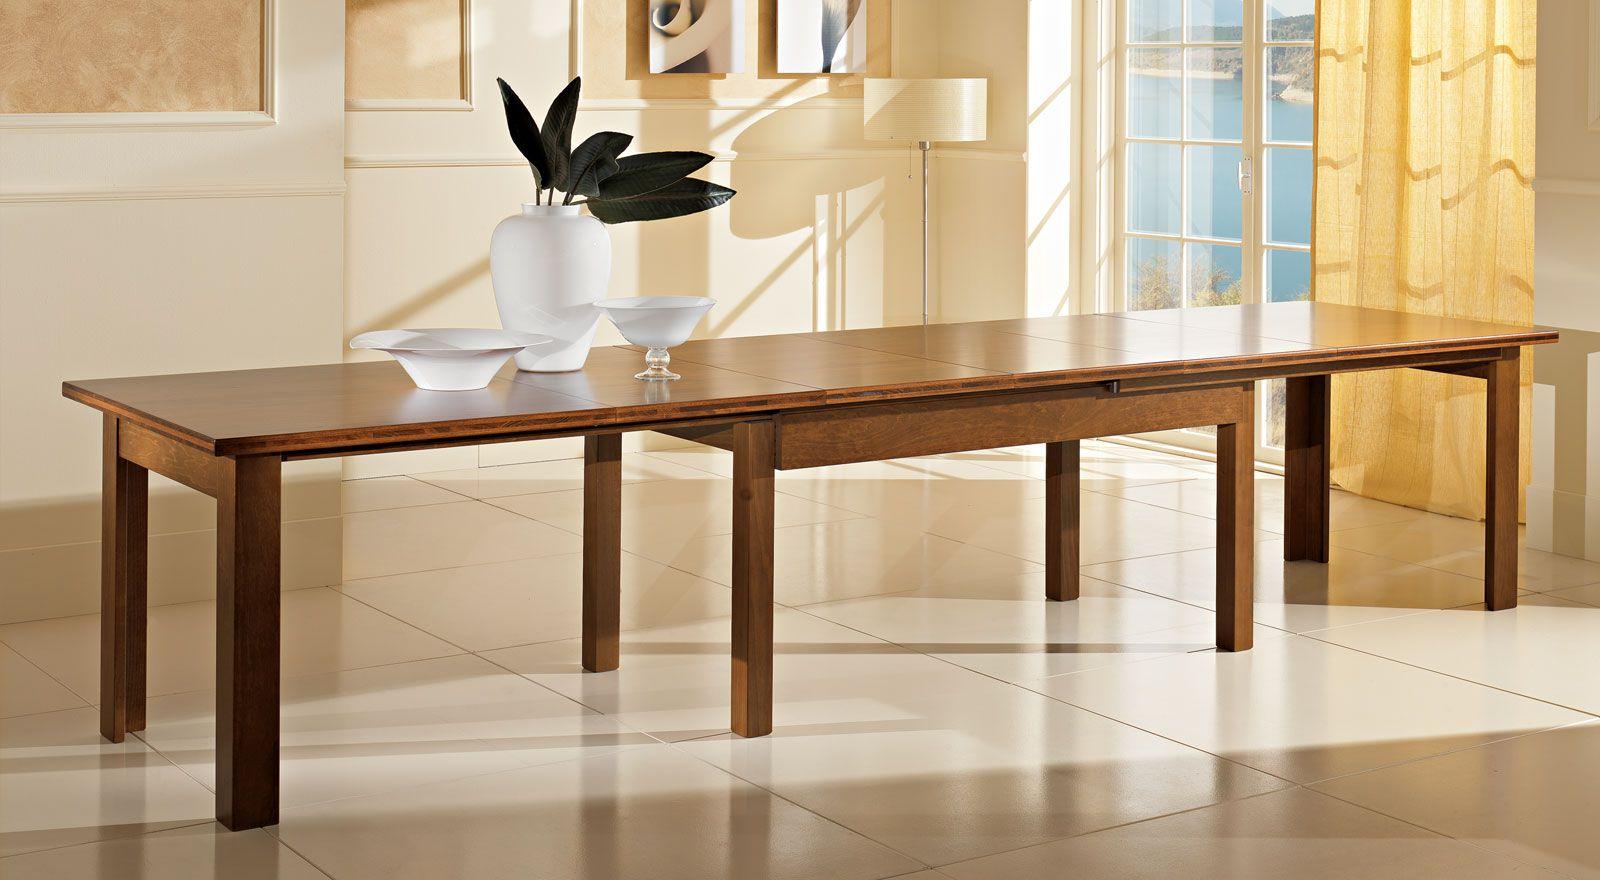 Tavolo Allungabile 4 Metri.Tavolo In Legno Allungabile A 4 Metri Art Wood Nel 2020 Tavoli